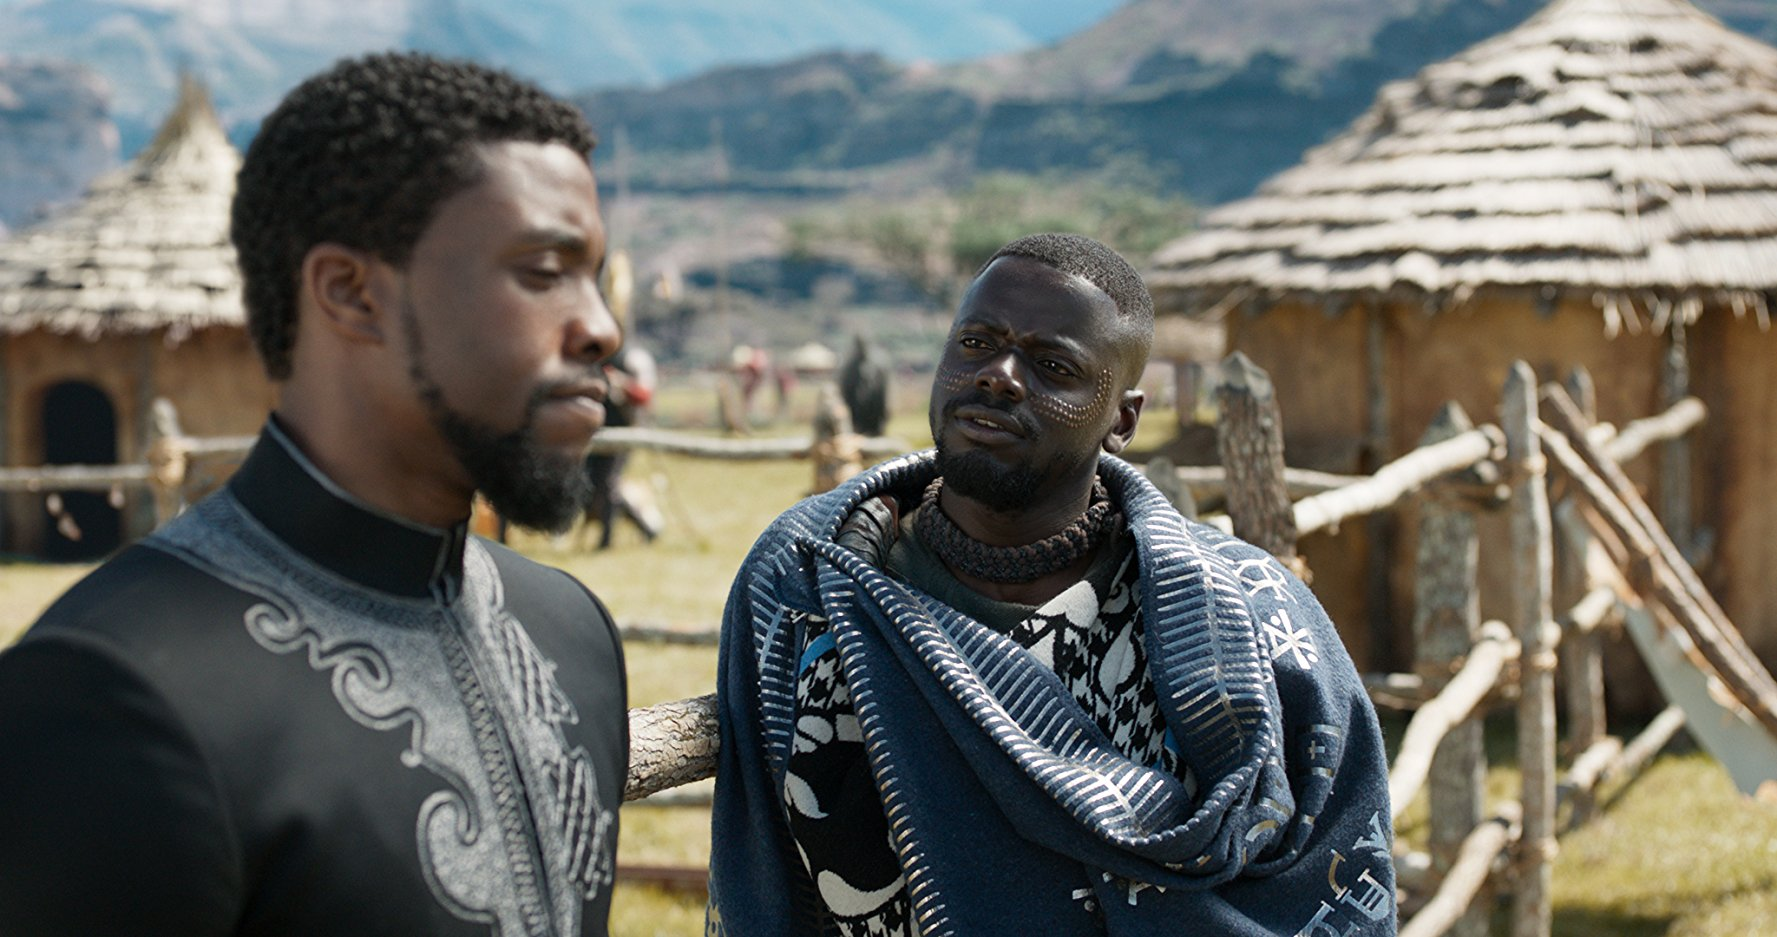 Reseña de la película Pantera Negra - Black Panther (2018)